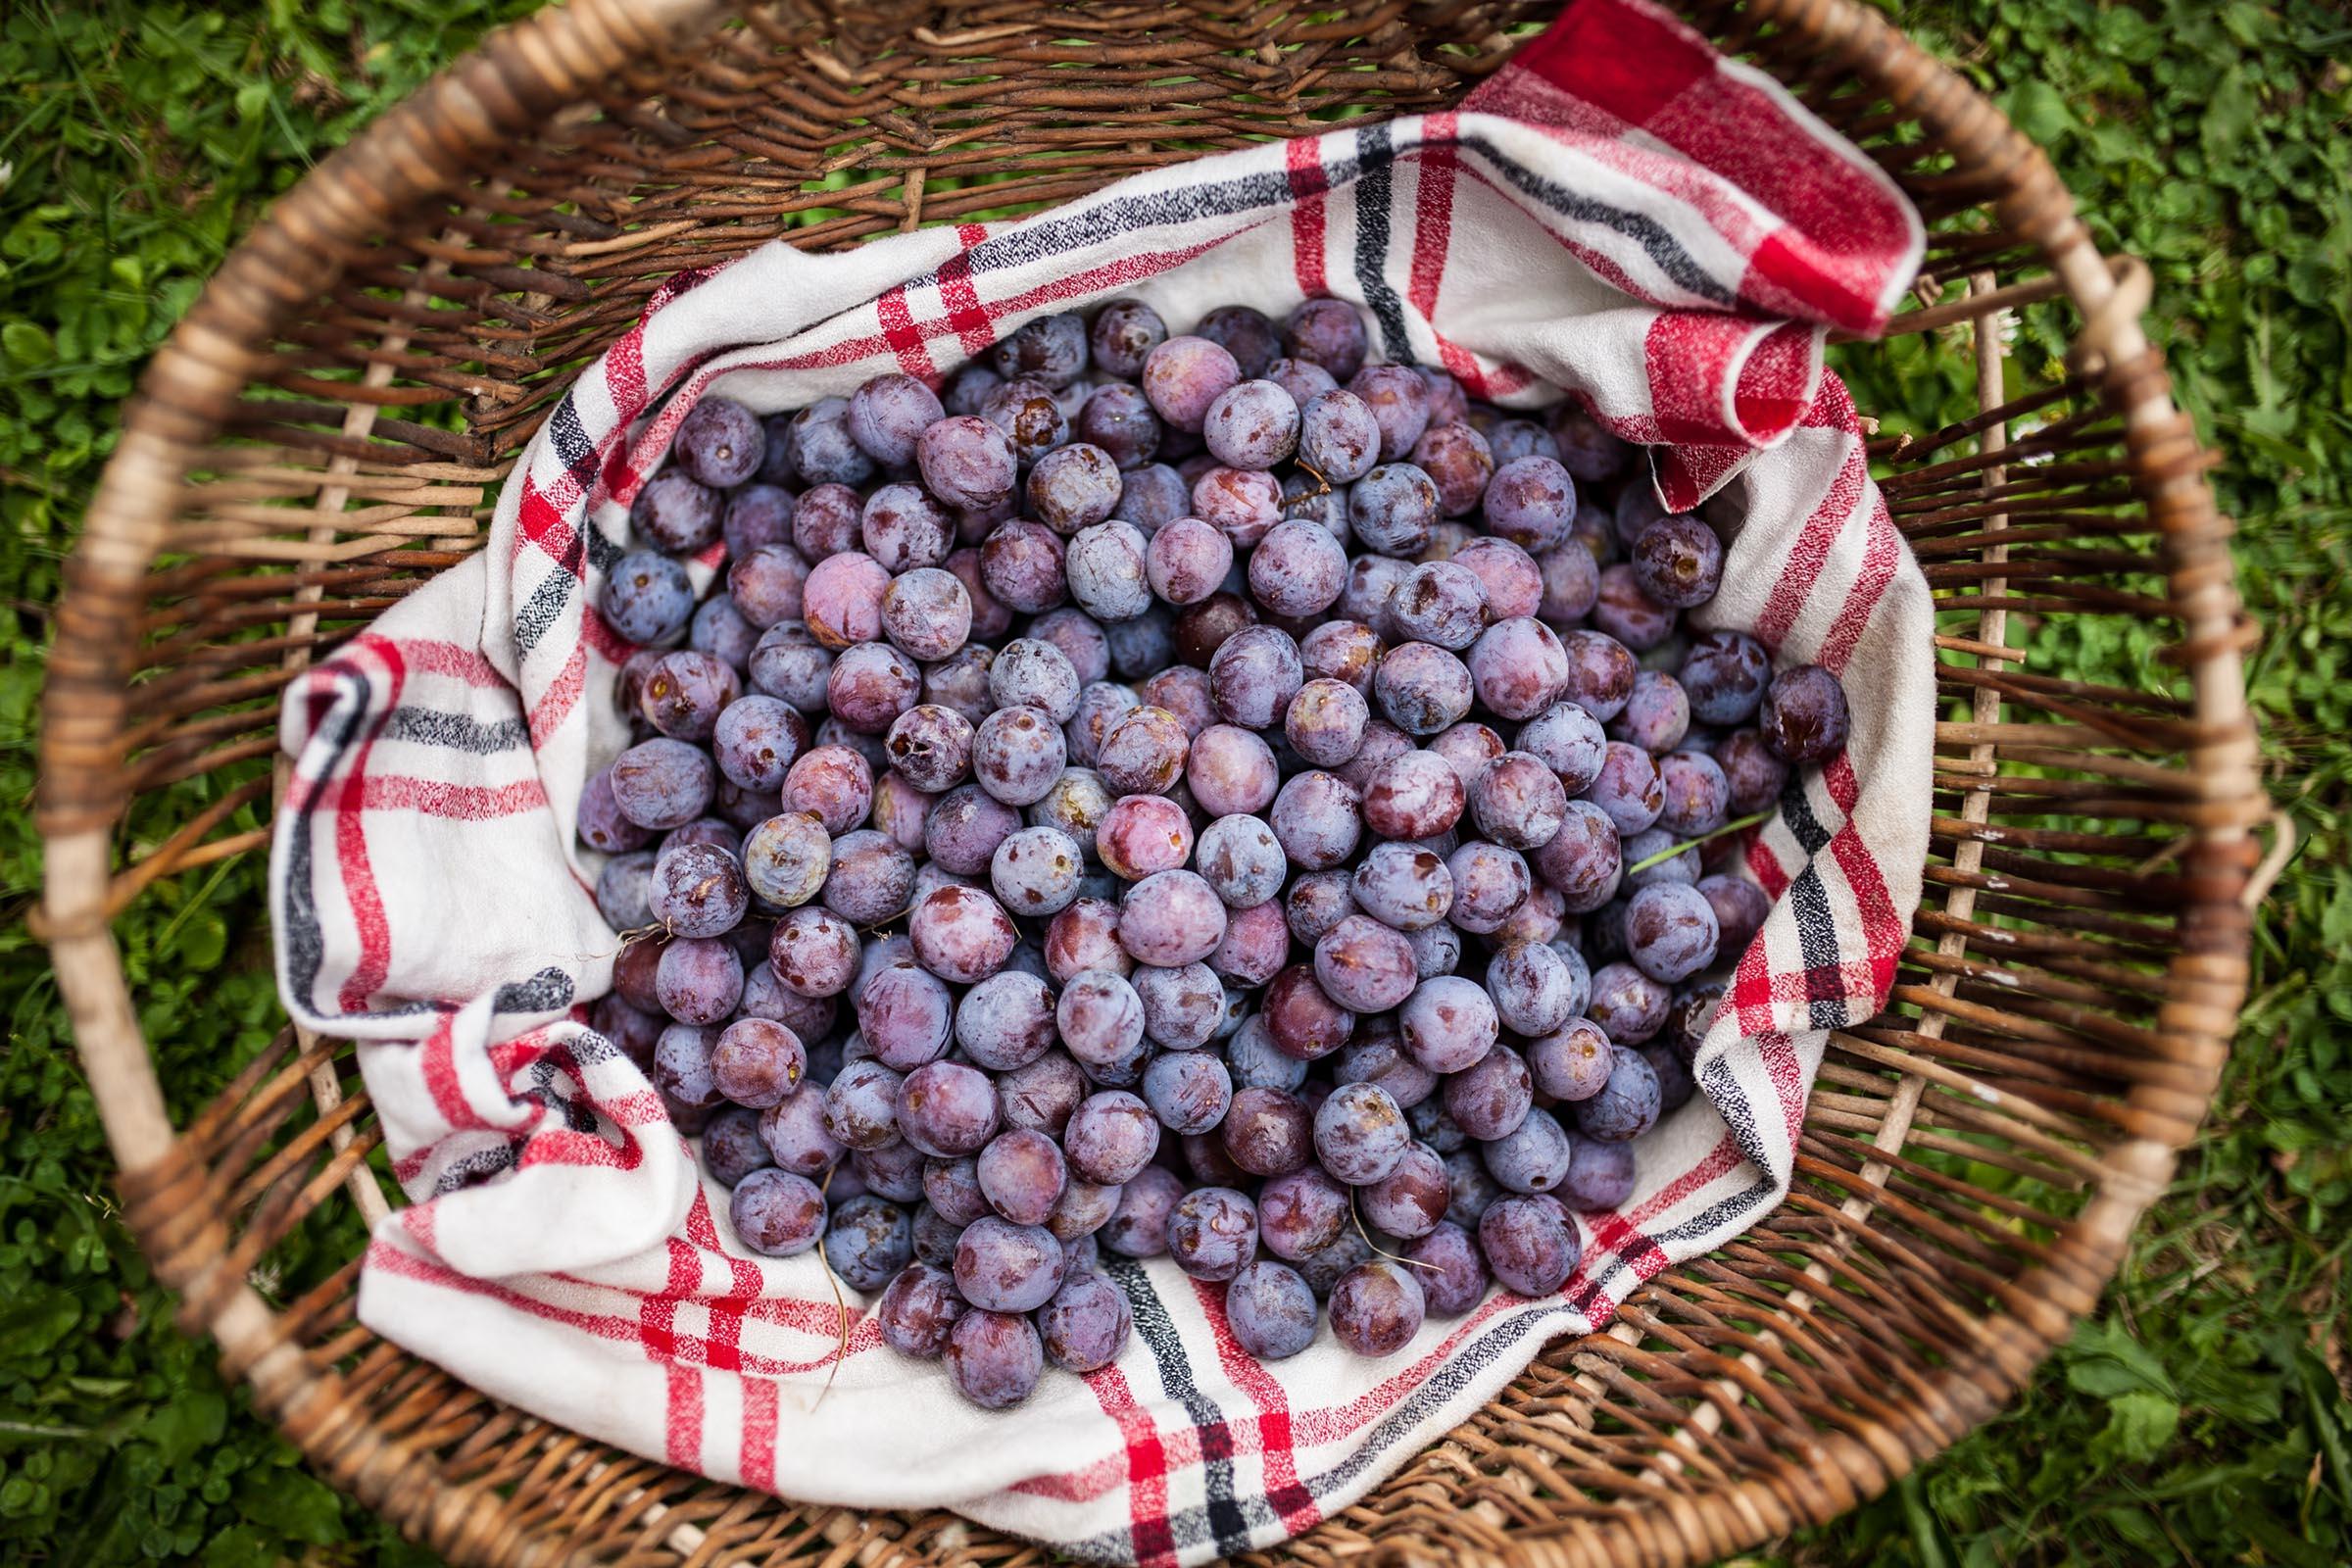 Panier de prunes rouges de Montaut